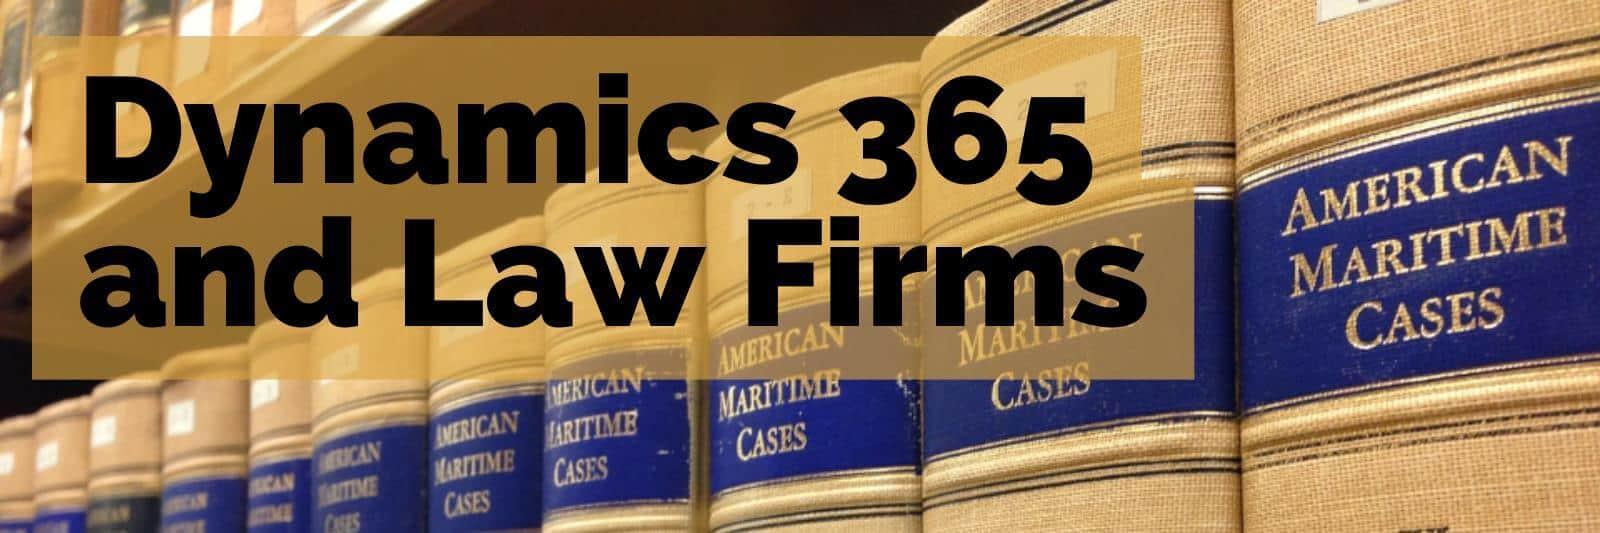 Dynamics 365 for Law Firms at enCloud9.com